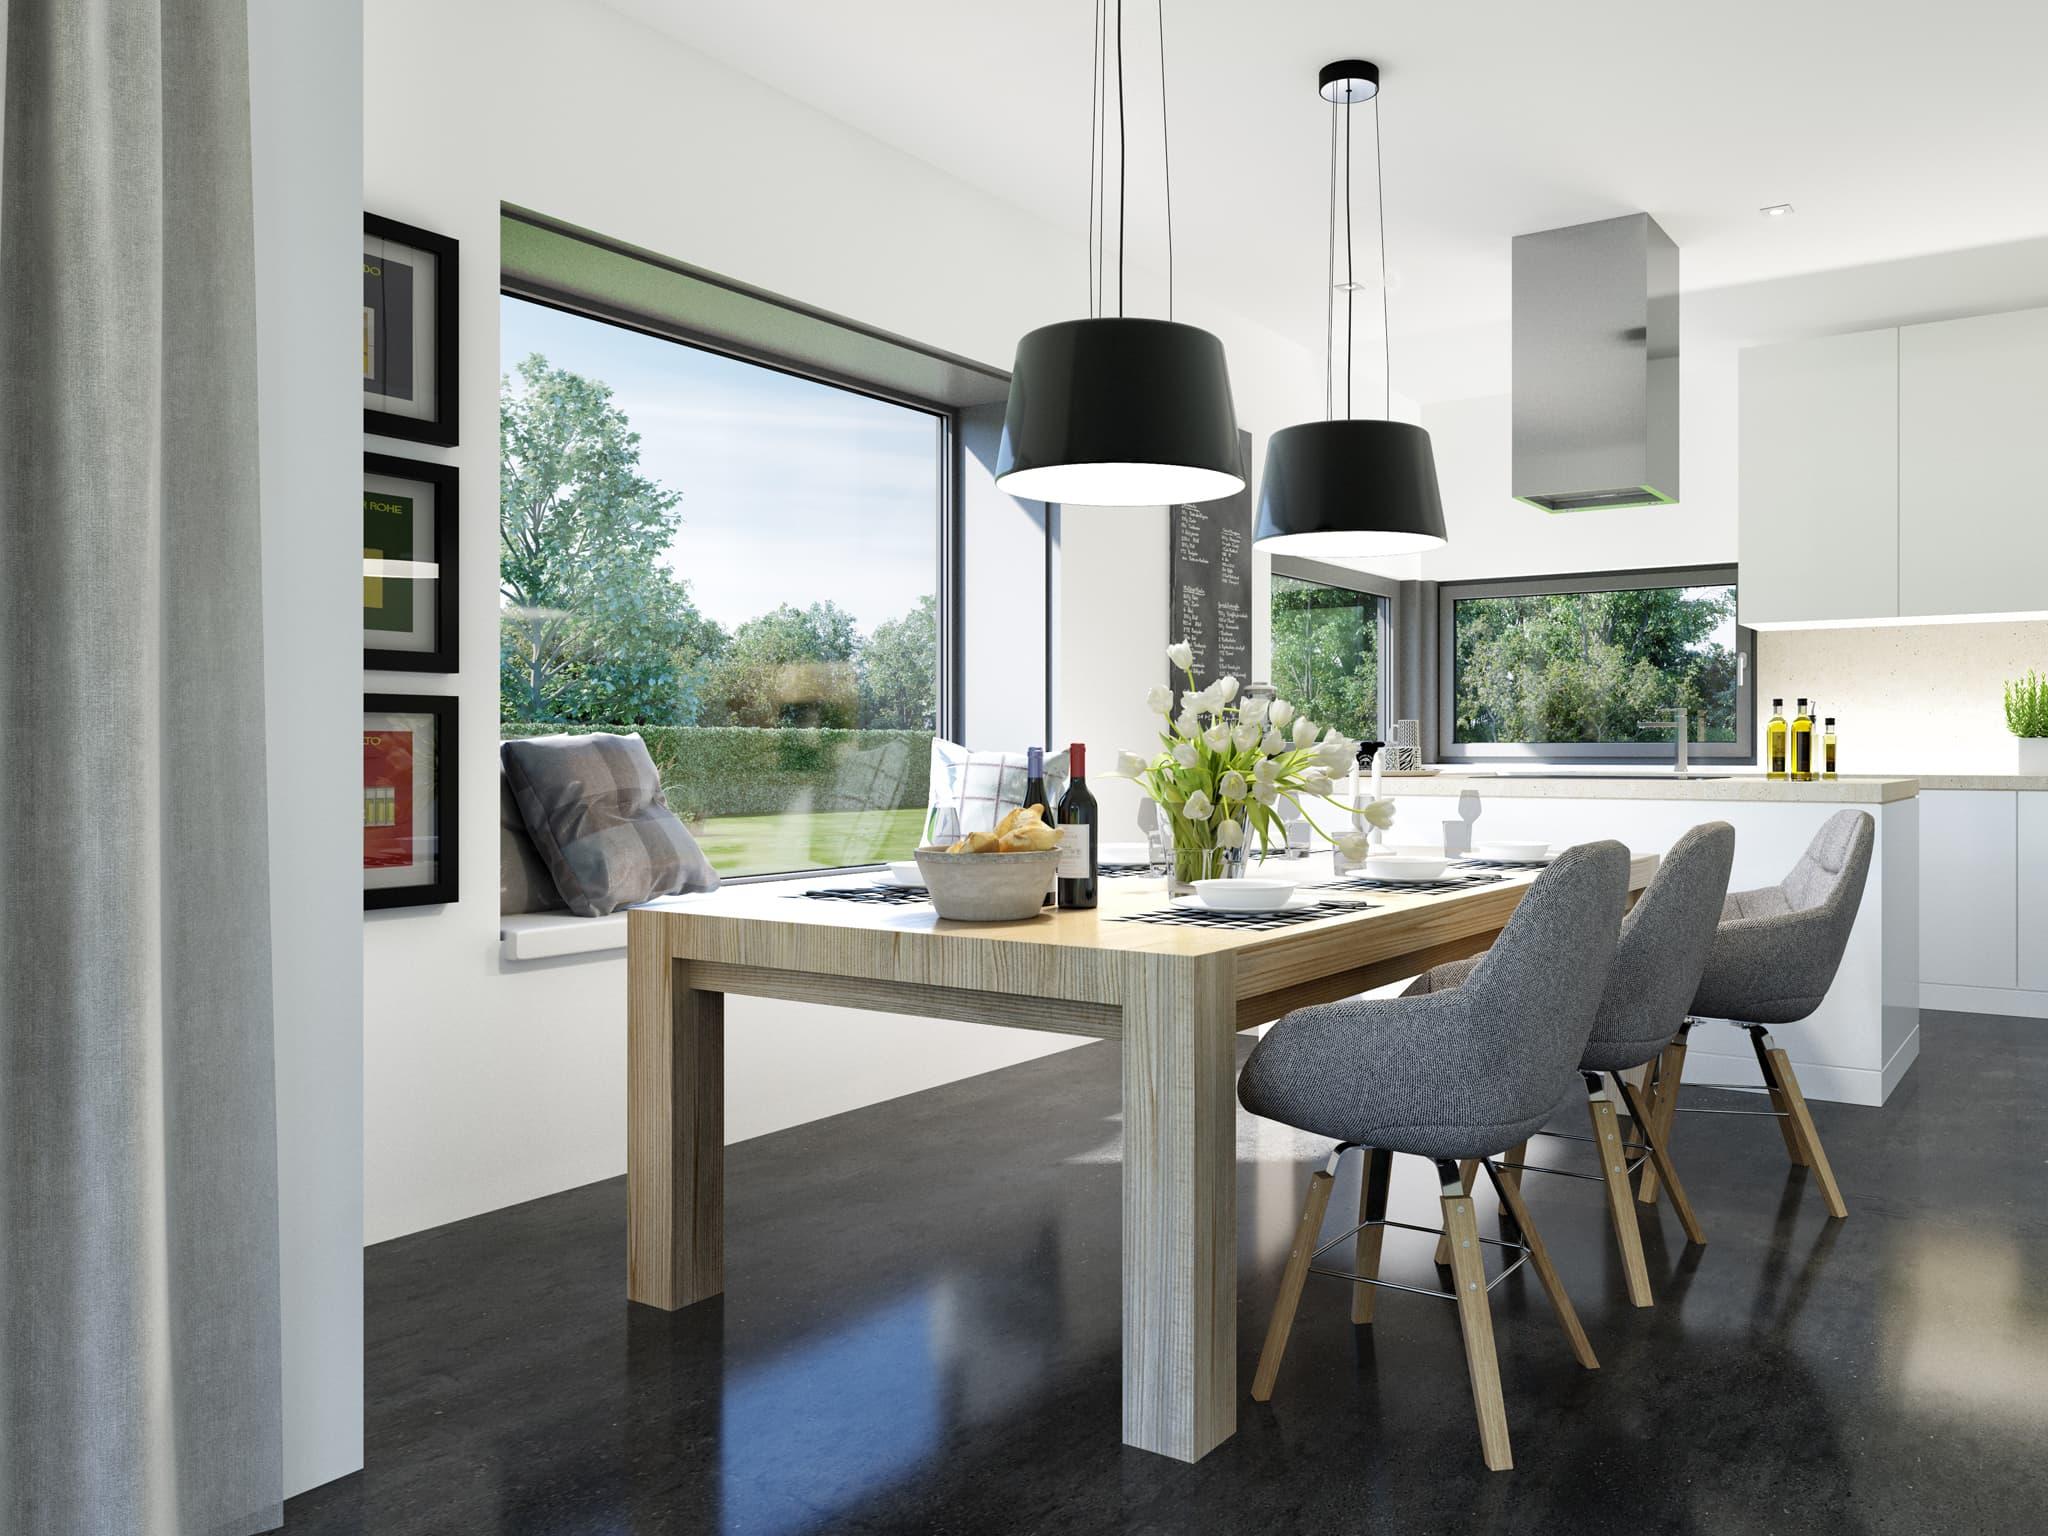 Offene Küche modern mit Esstisch aus Holz - Ideen Inneneinrichtung Haus Bien Zenker Fertighaus FANTASTIC 161 V2 - HausbauDirekt.de